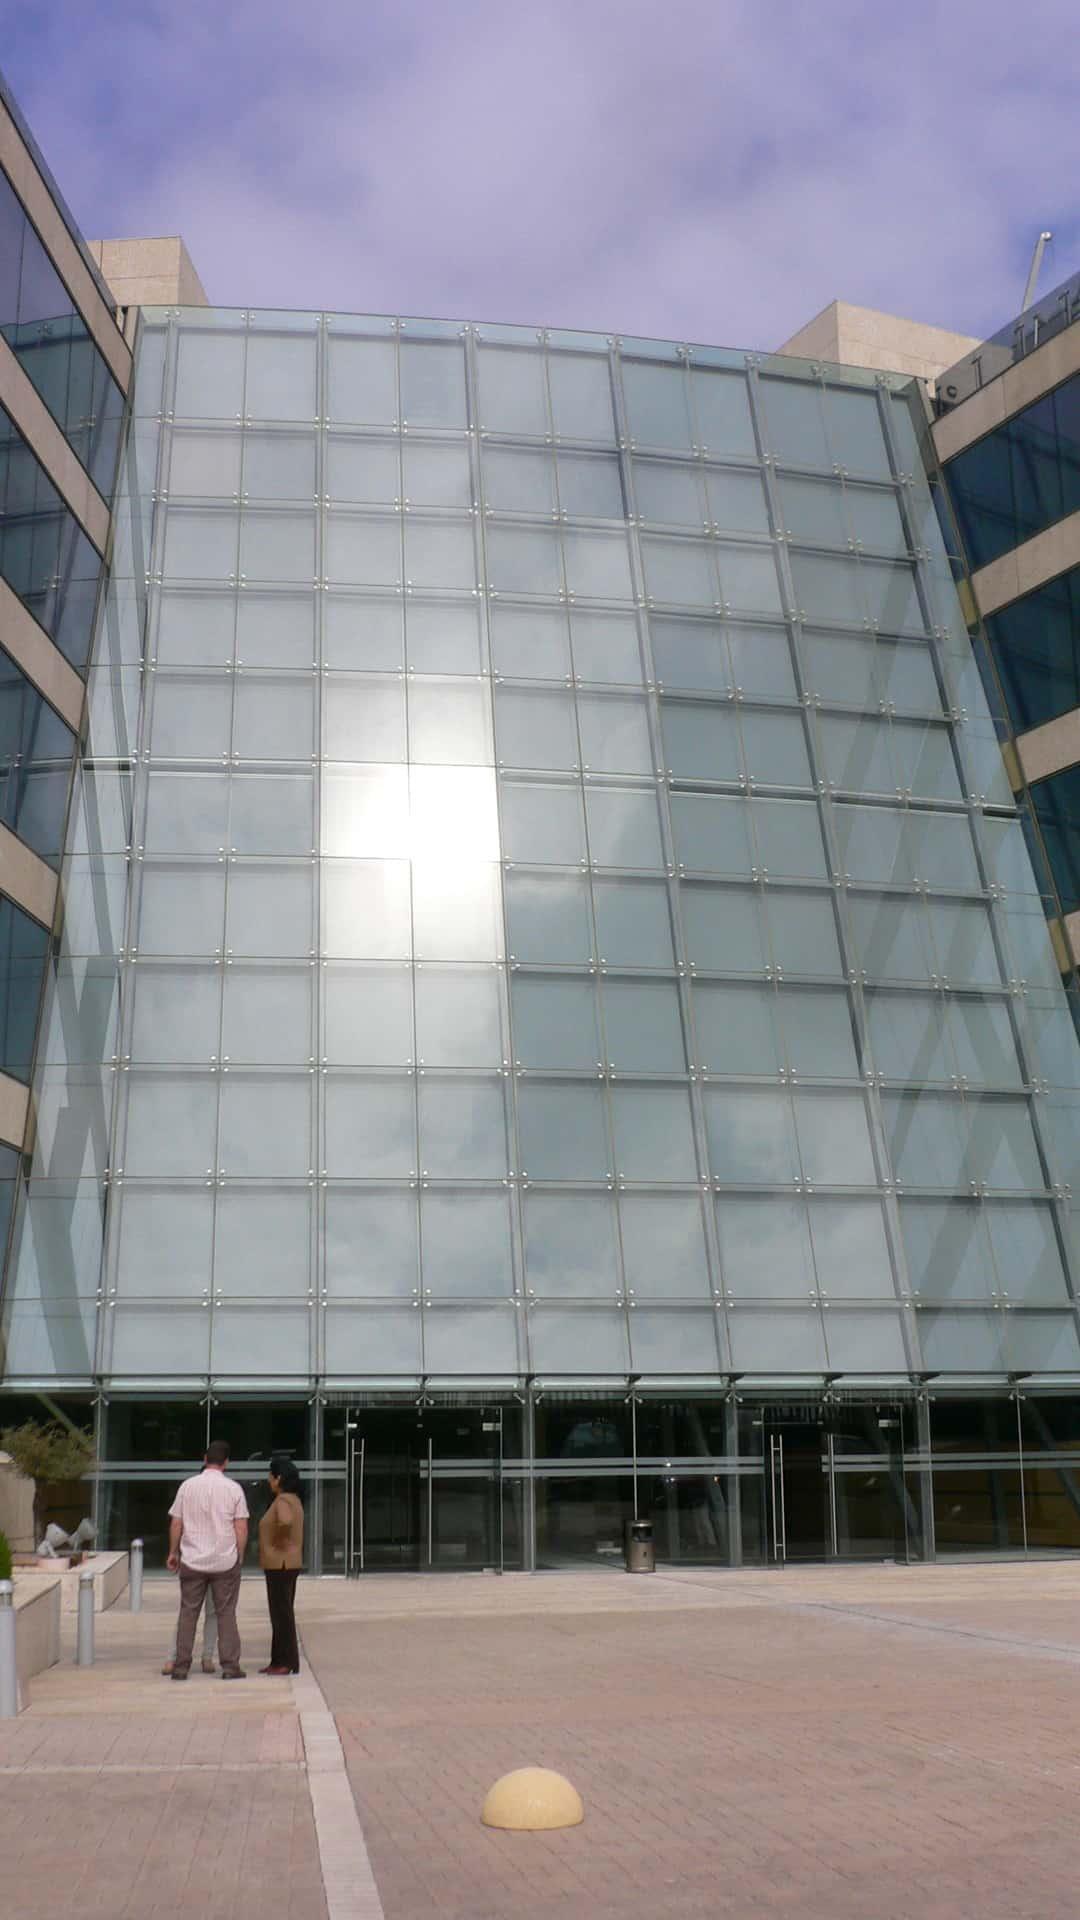 MOÑITA fachada con lona